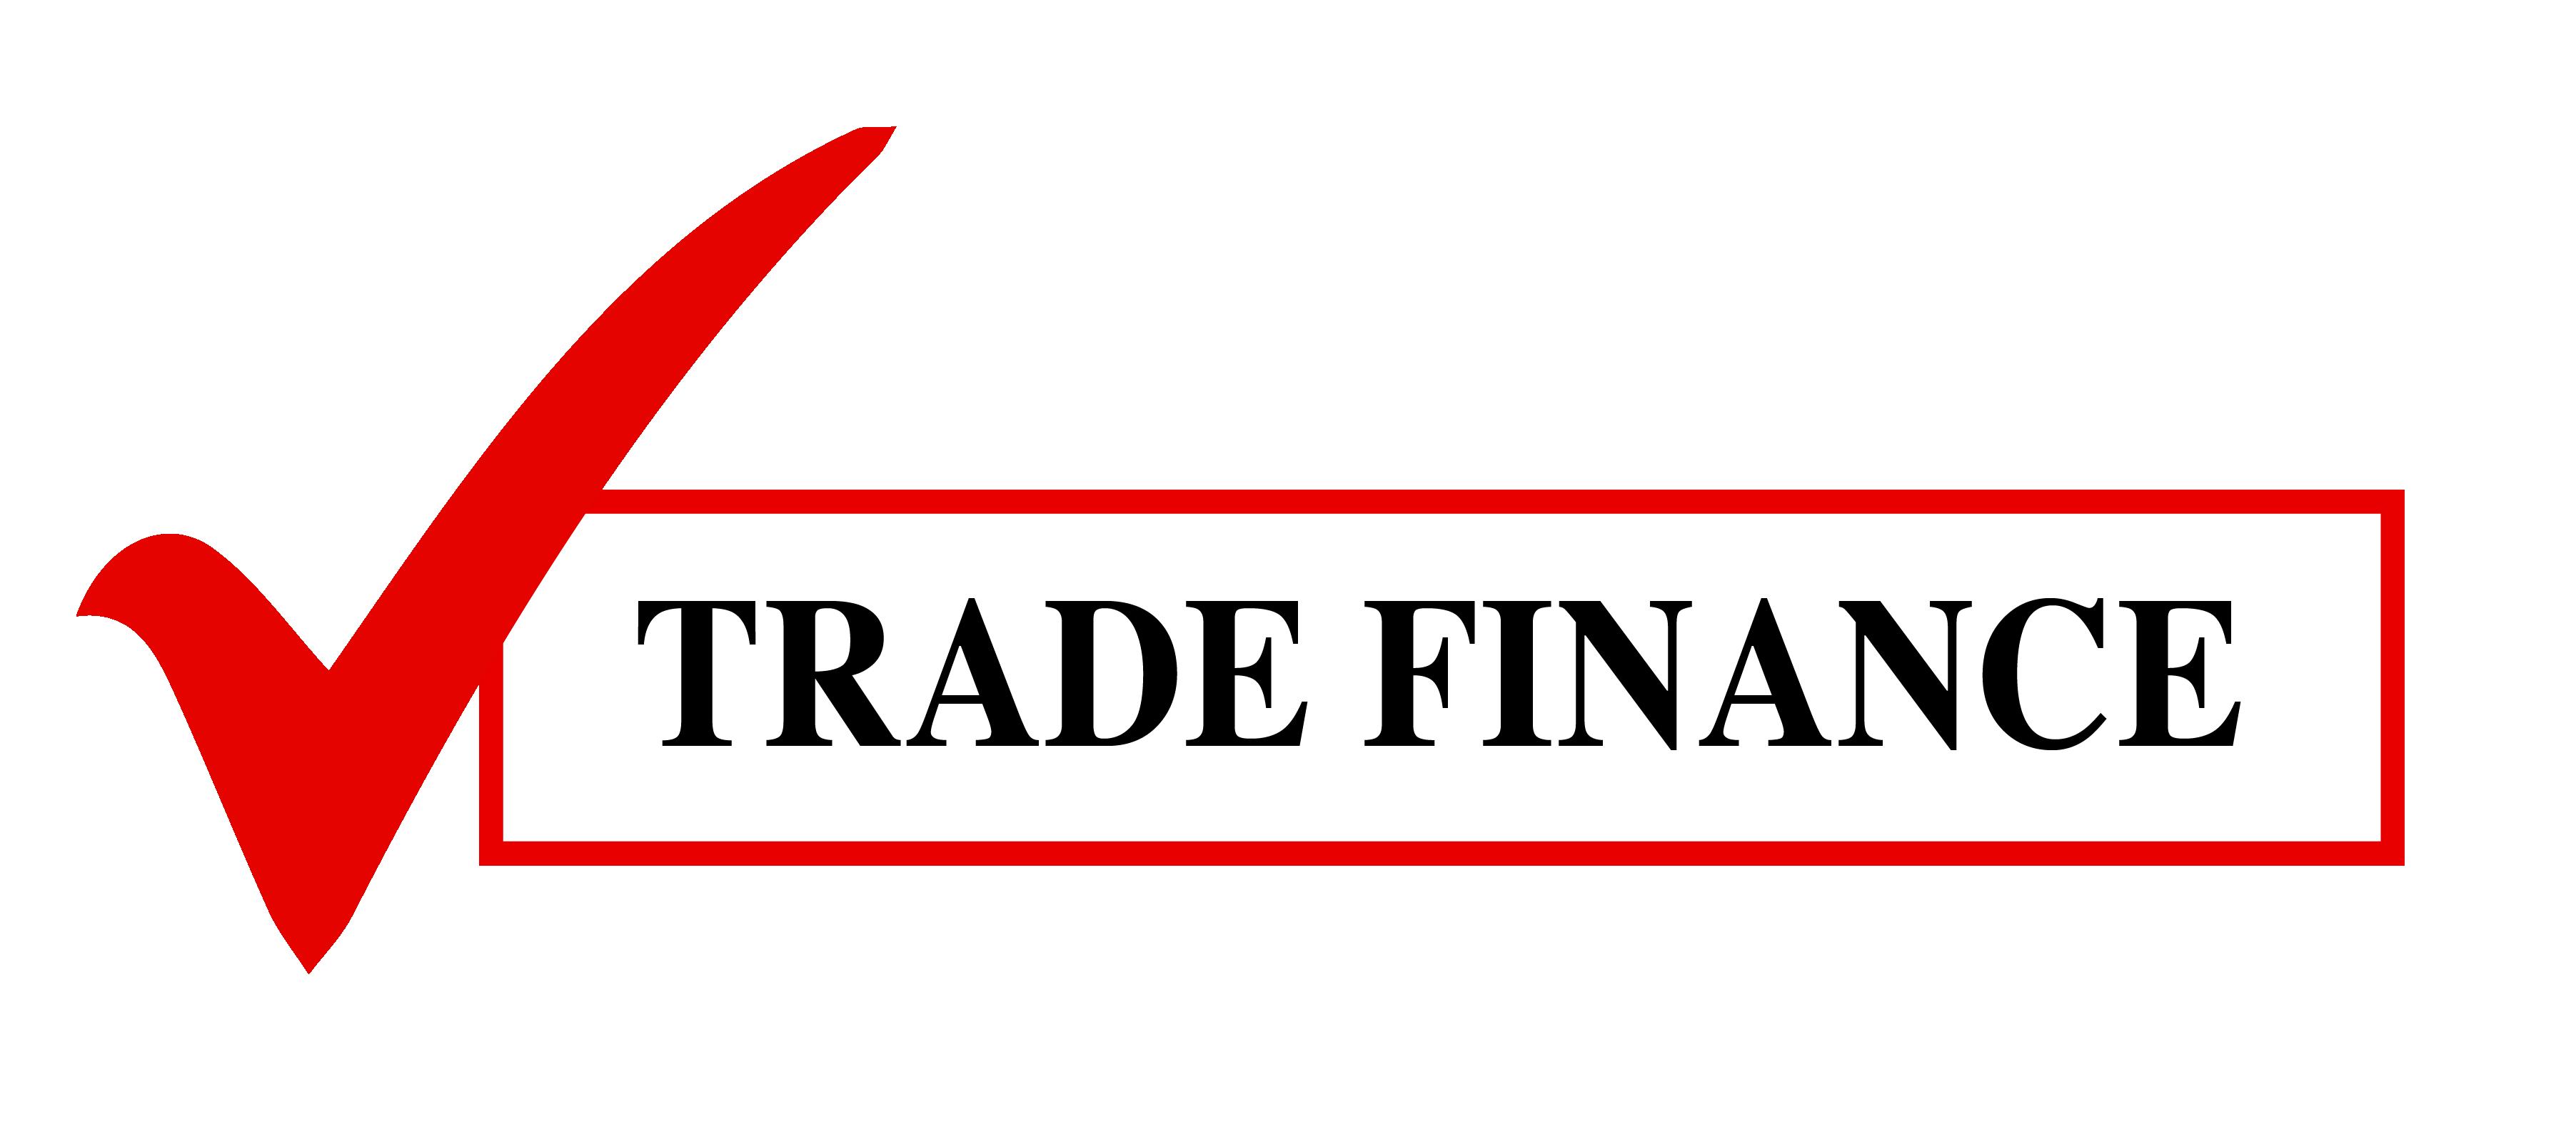 Trade Finance from Trade Windows Derby